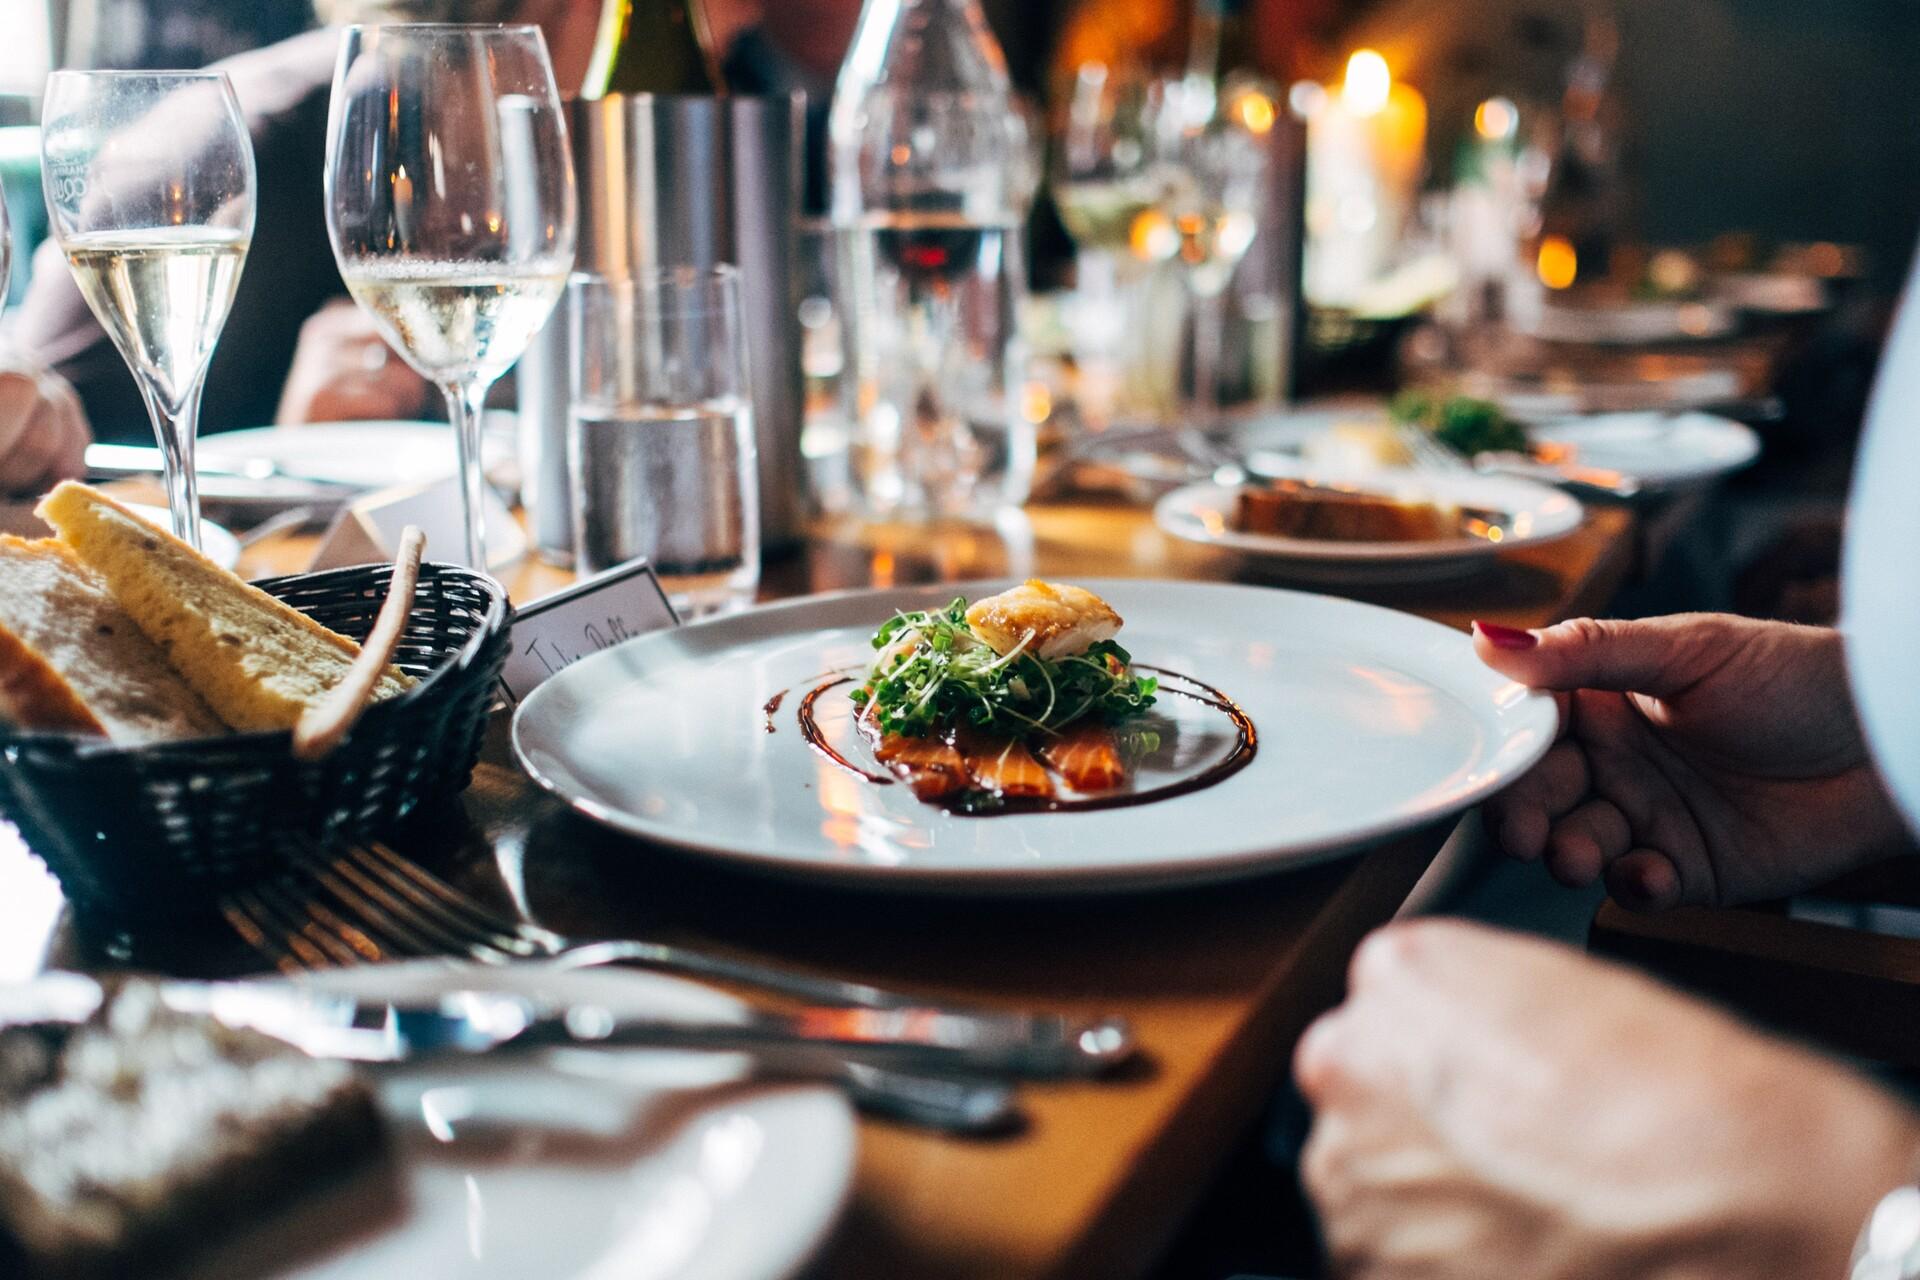 Dove mangiare a Lubiana - Cucina e gastronomia slovena a Lubiana